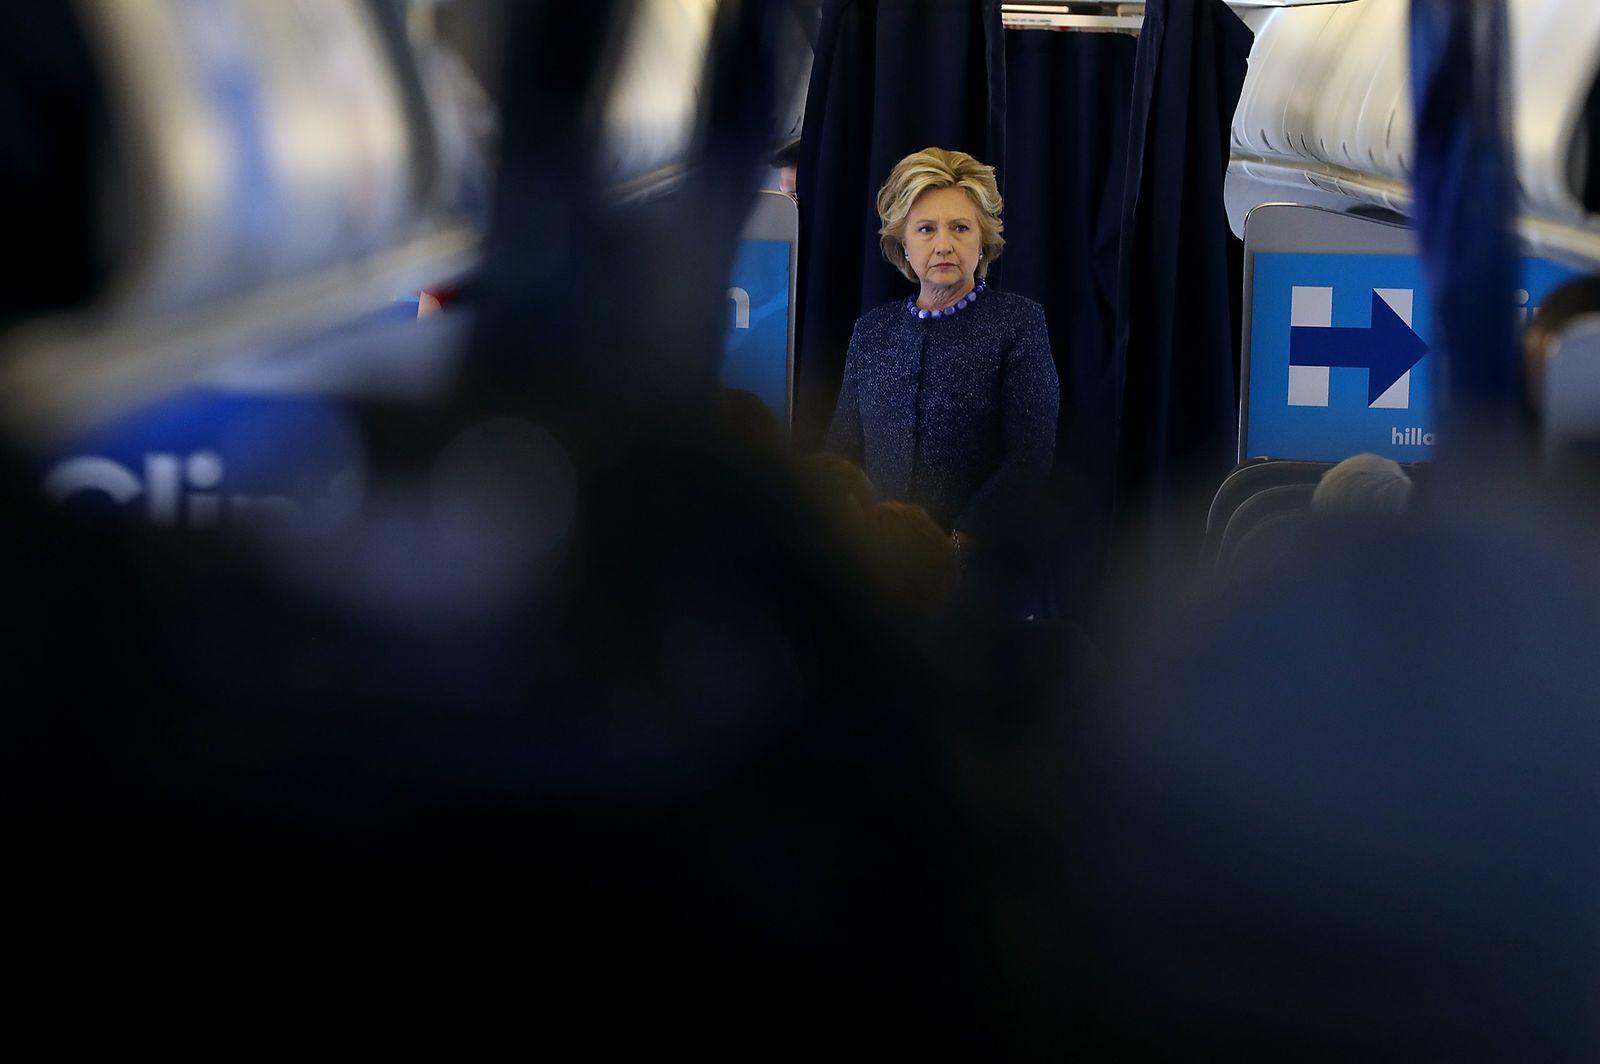 Clinton Hillary